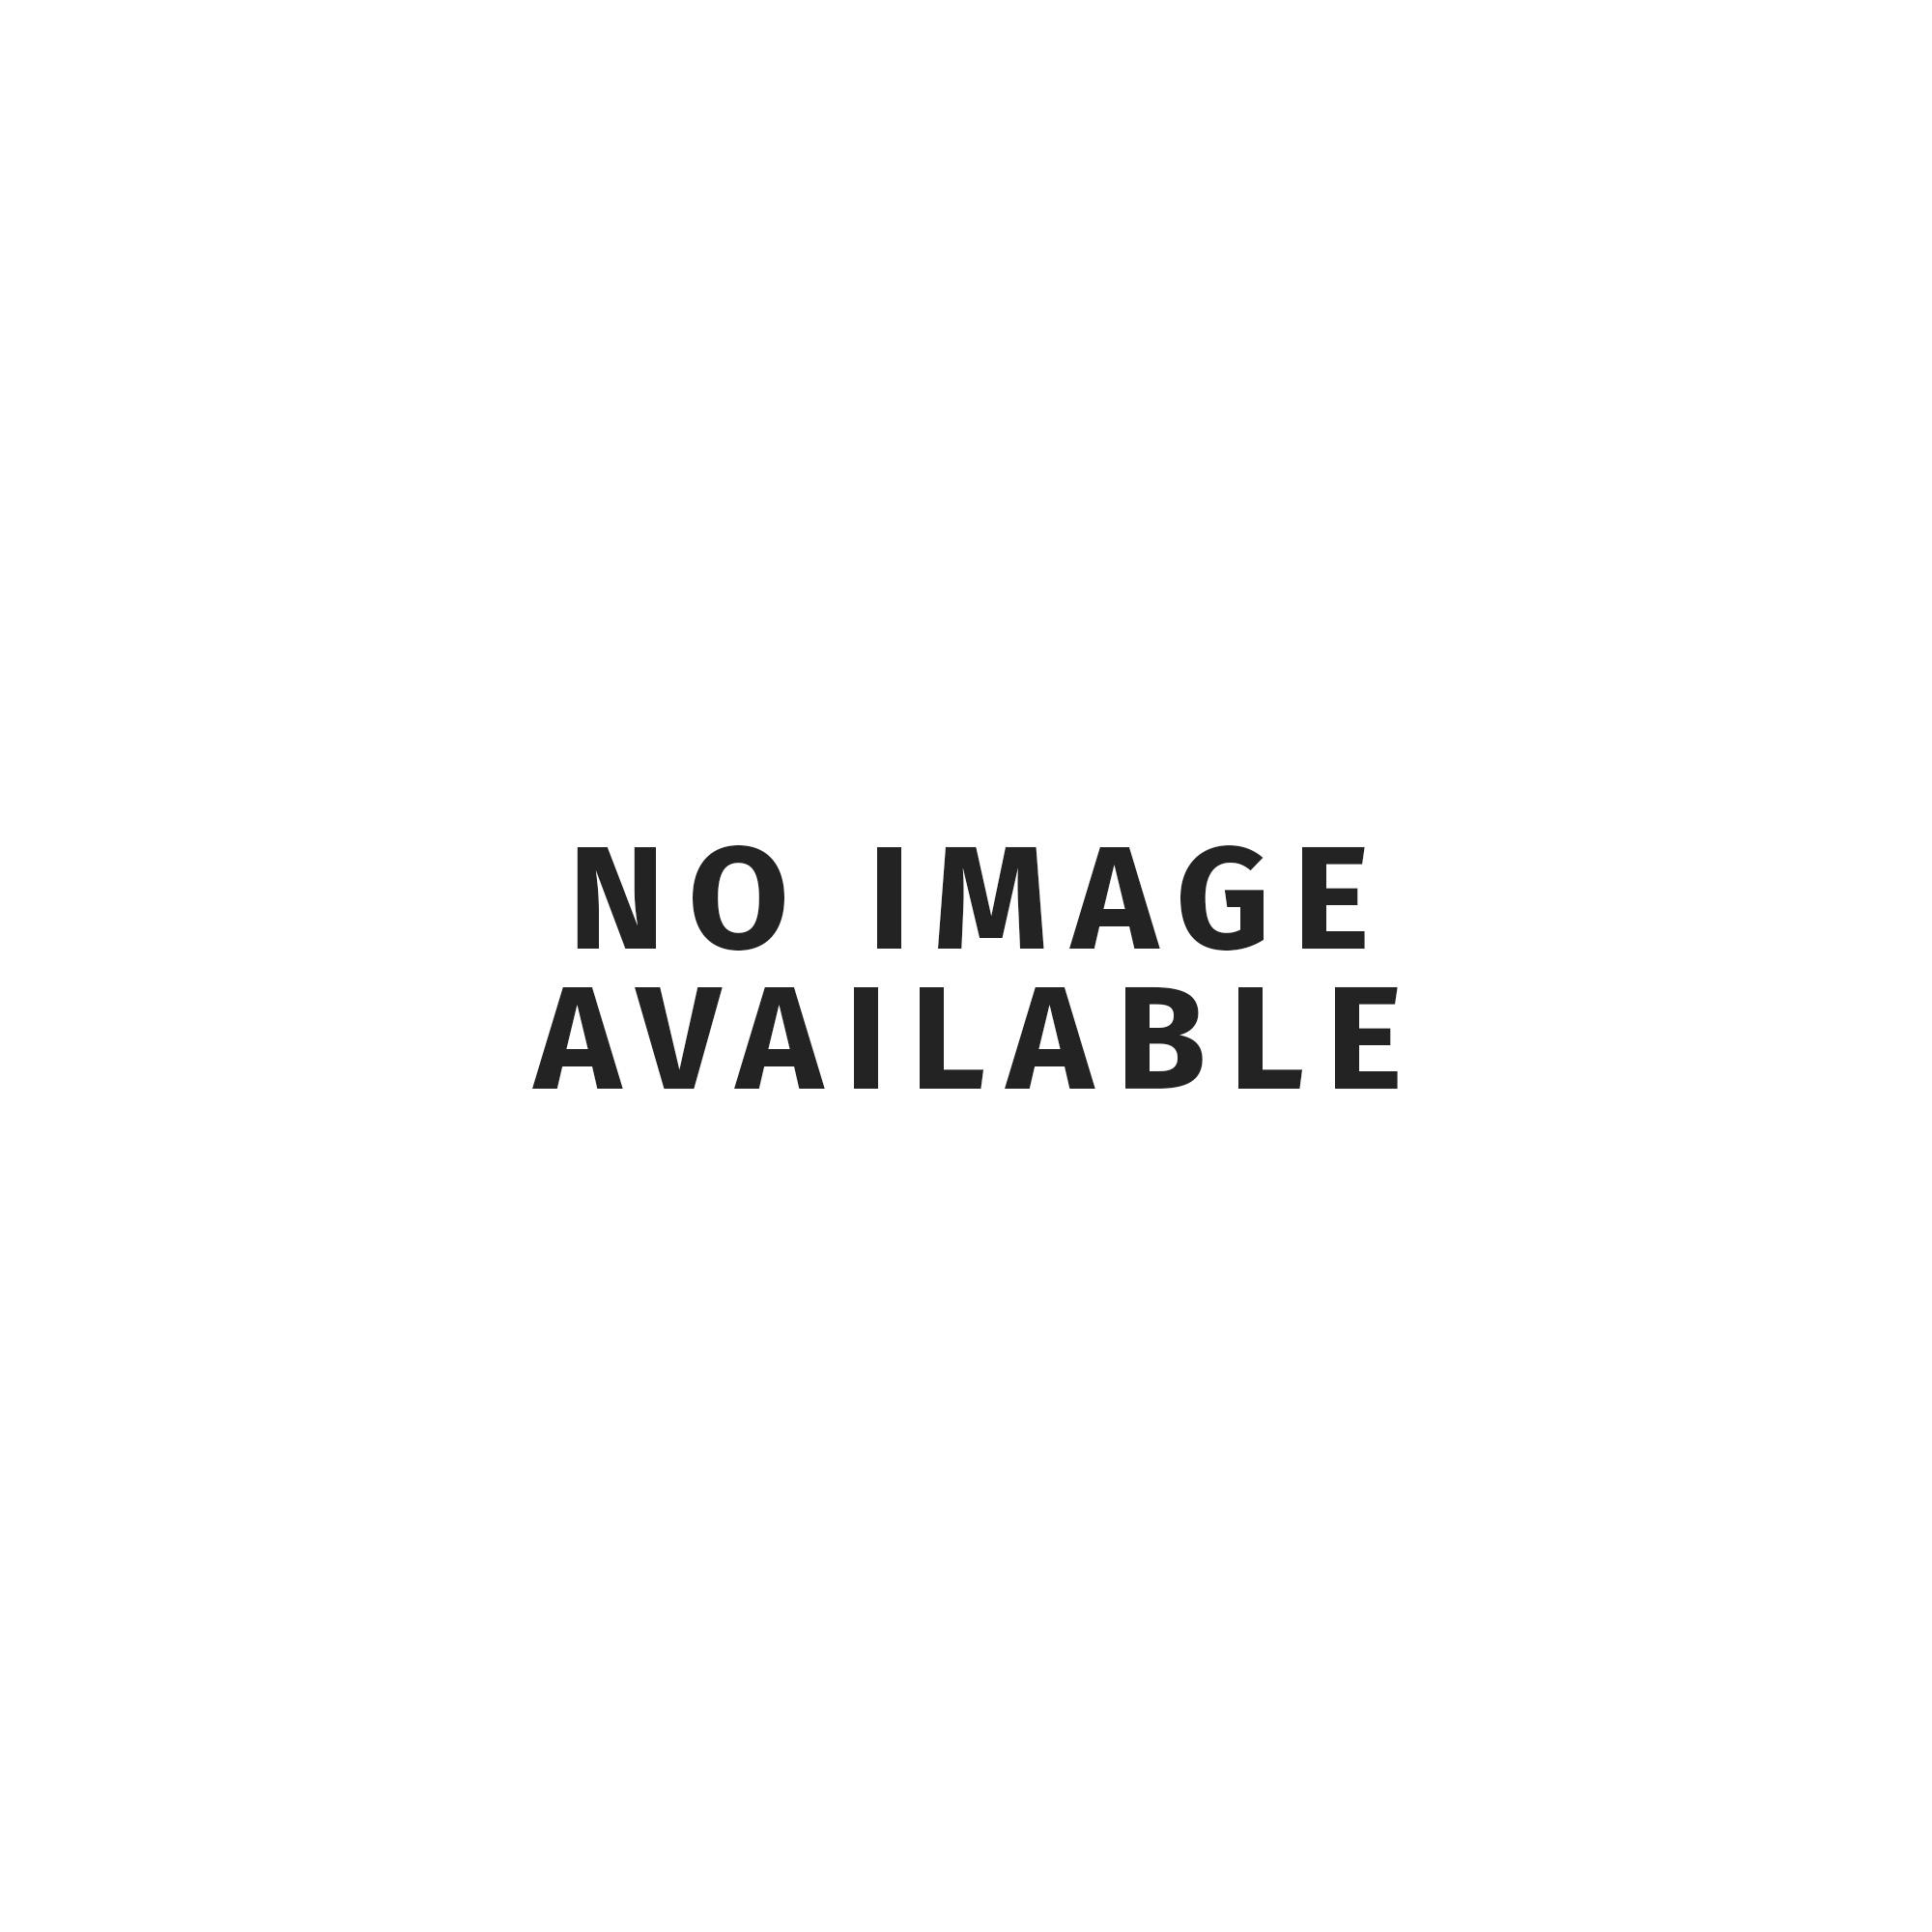 Crud Roadracer MK3 Mudguard Set